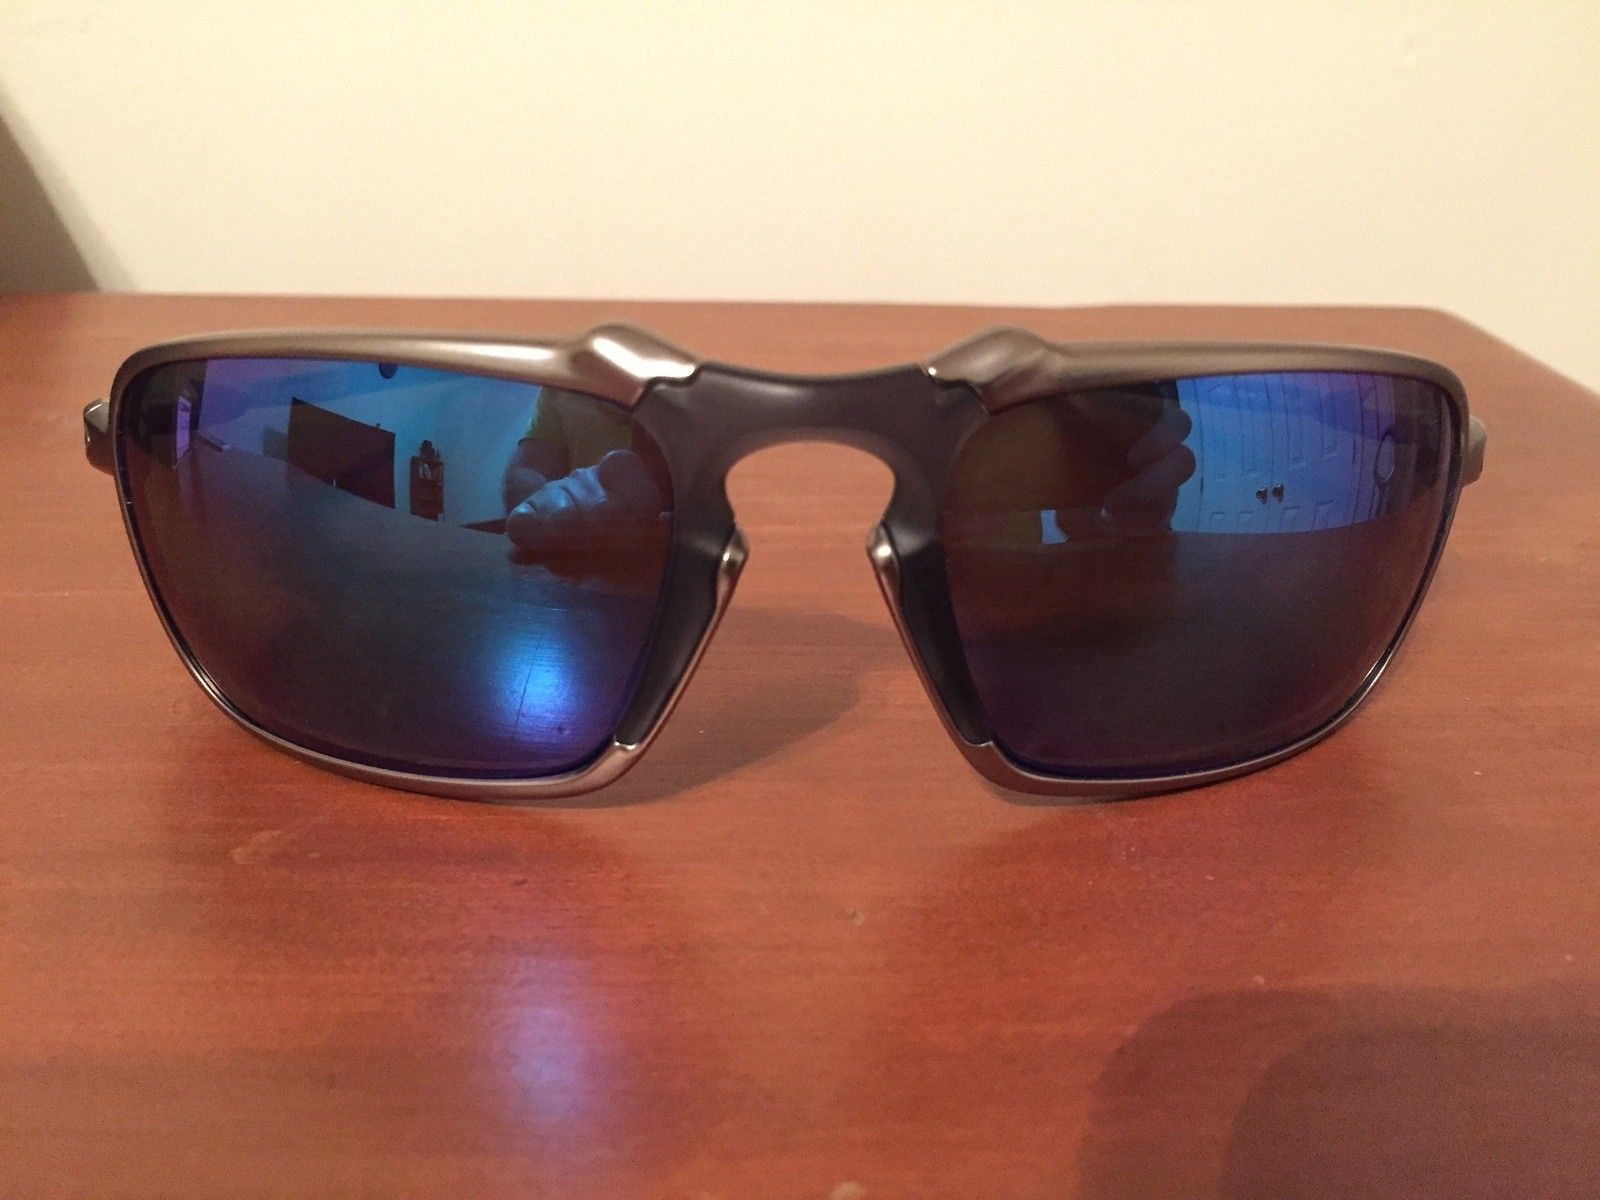 NEW Oakley Badman Sapphire Irid Polarized - IMG_6555.JPG